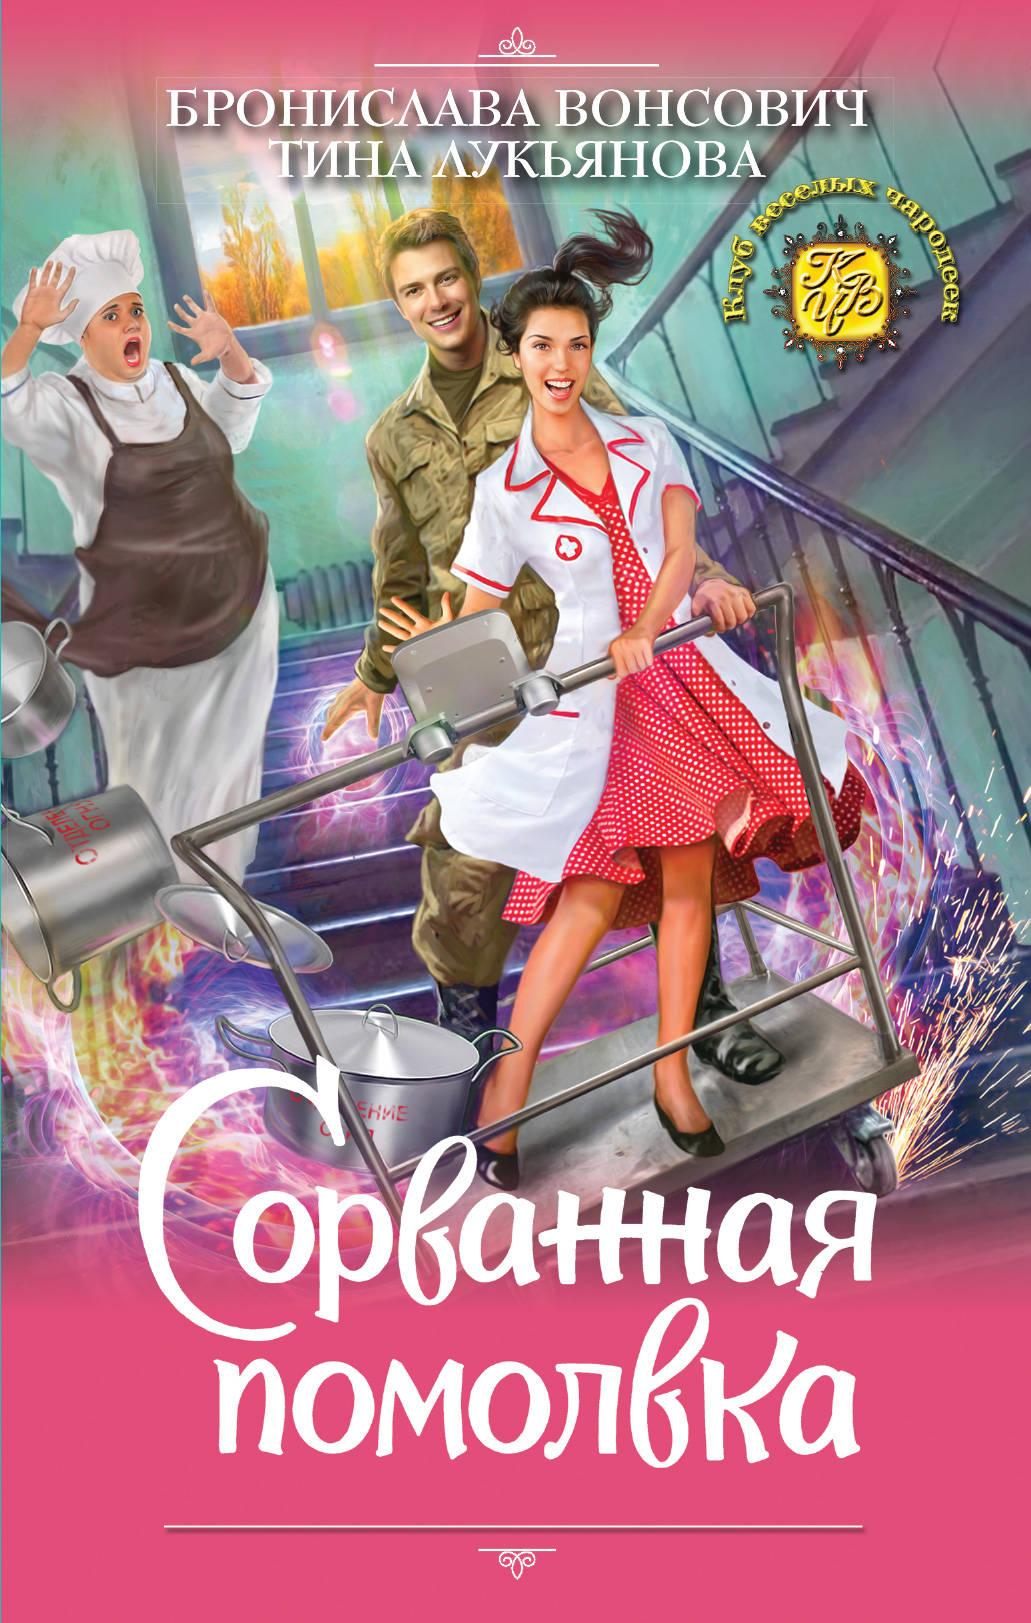 Вонсович Бронислава; Лукьянова Тина Сорванная помолвка